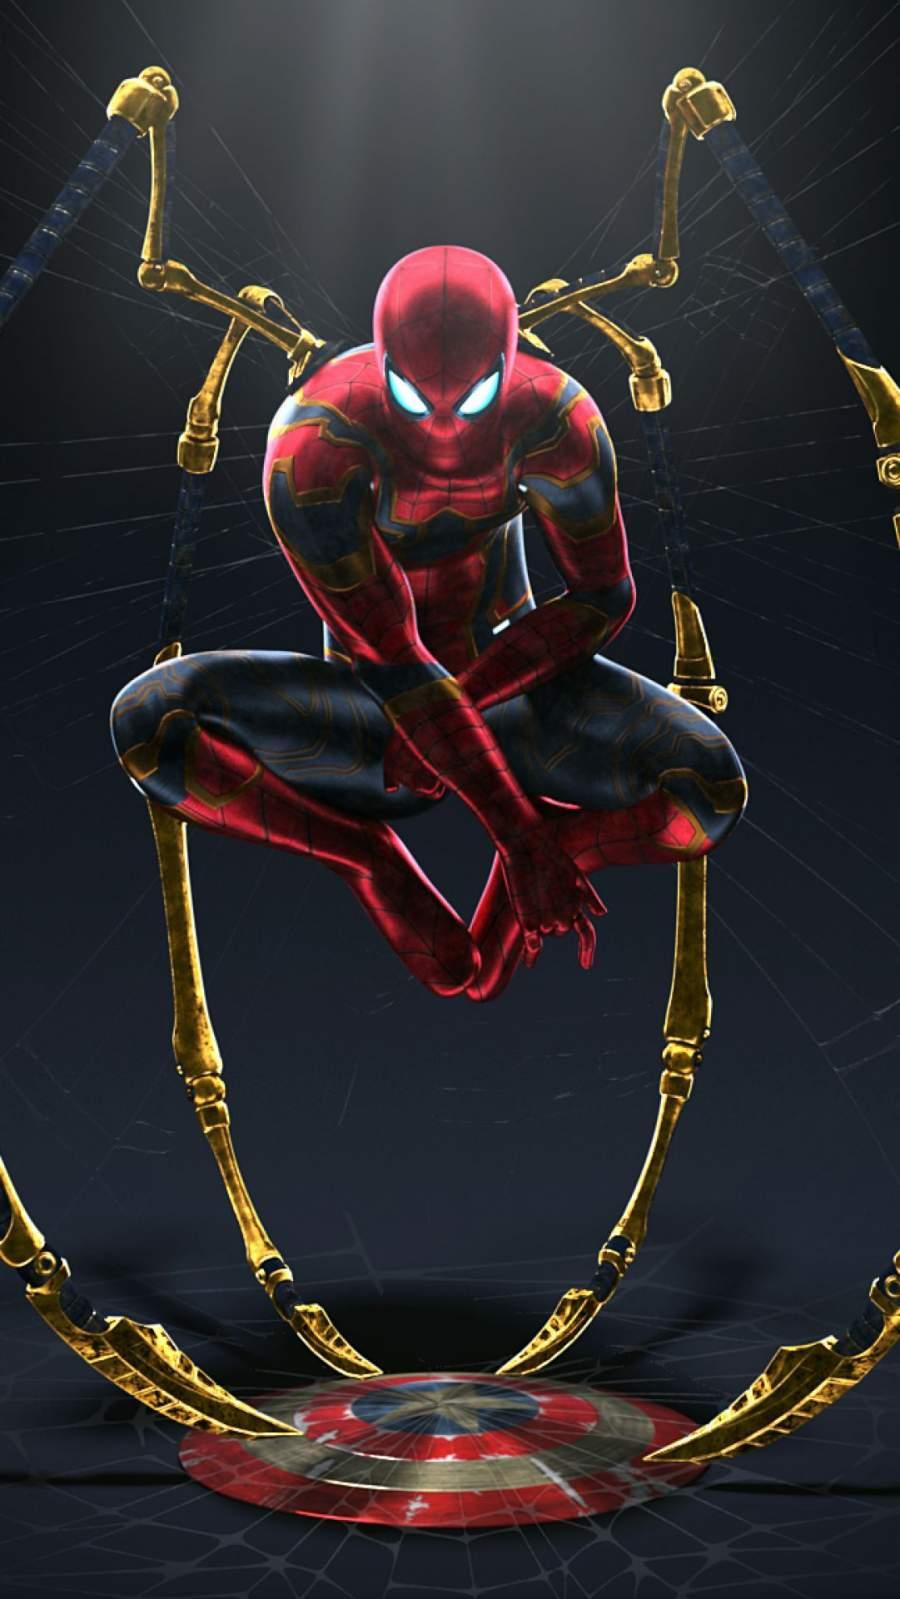 Spiderman vs Captain America iPhone Wallpaper